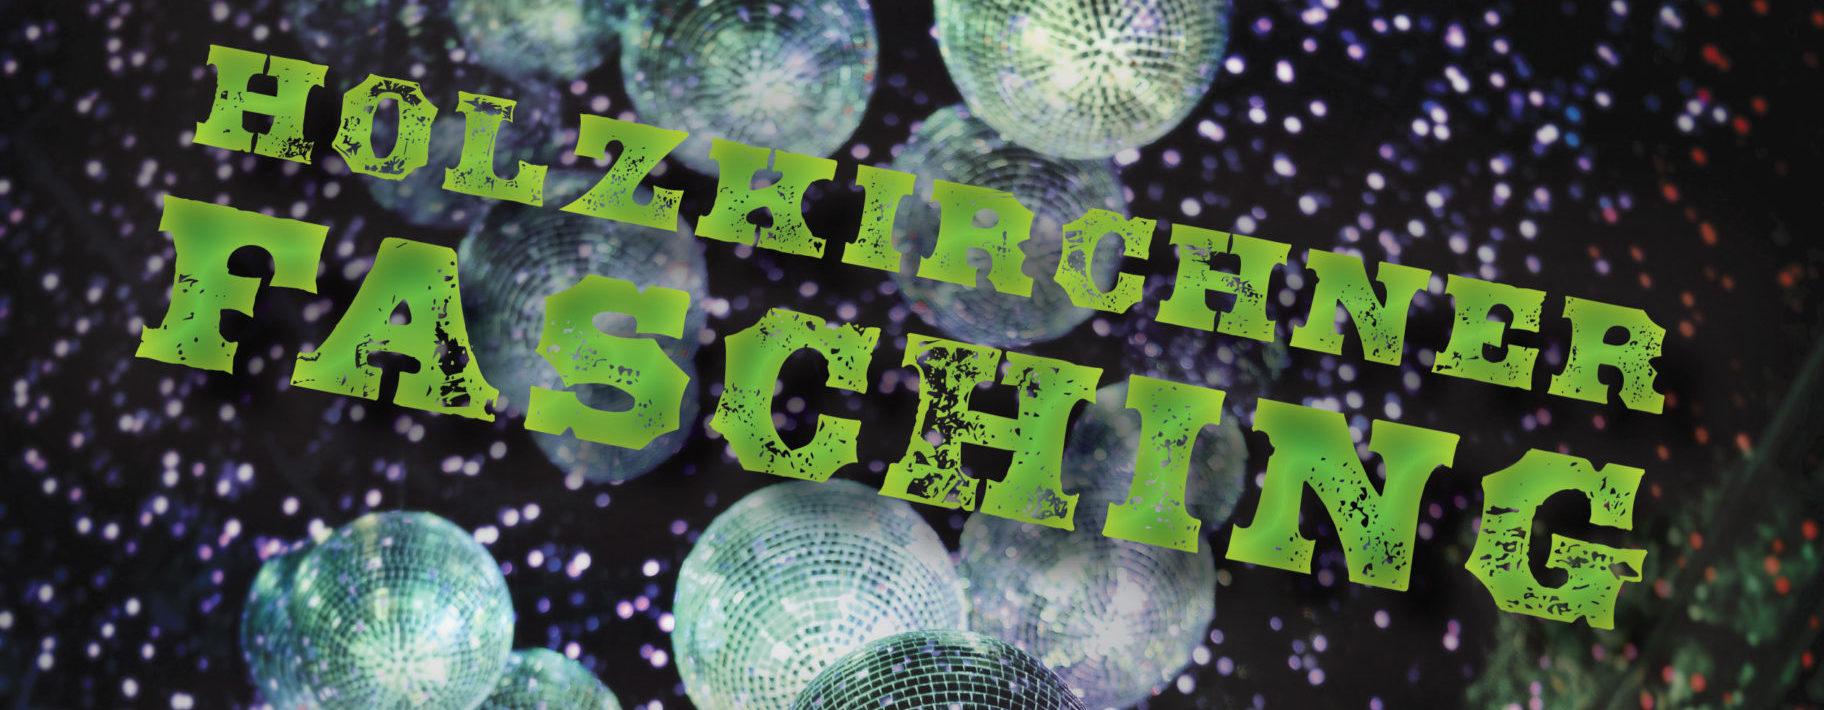 Holzkirchner Fasching 2020